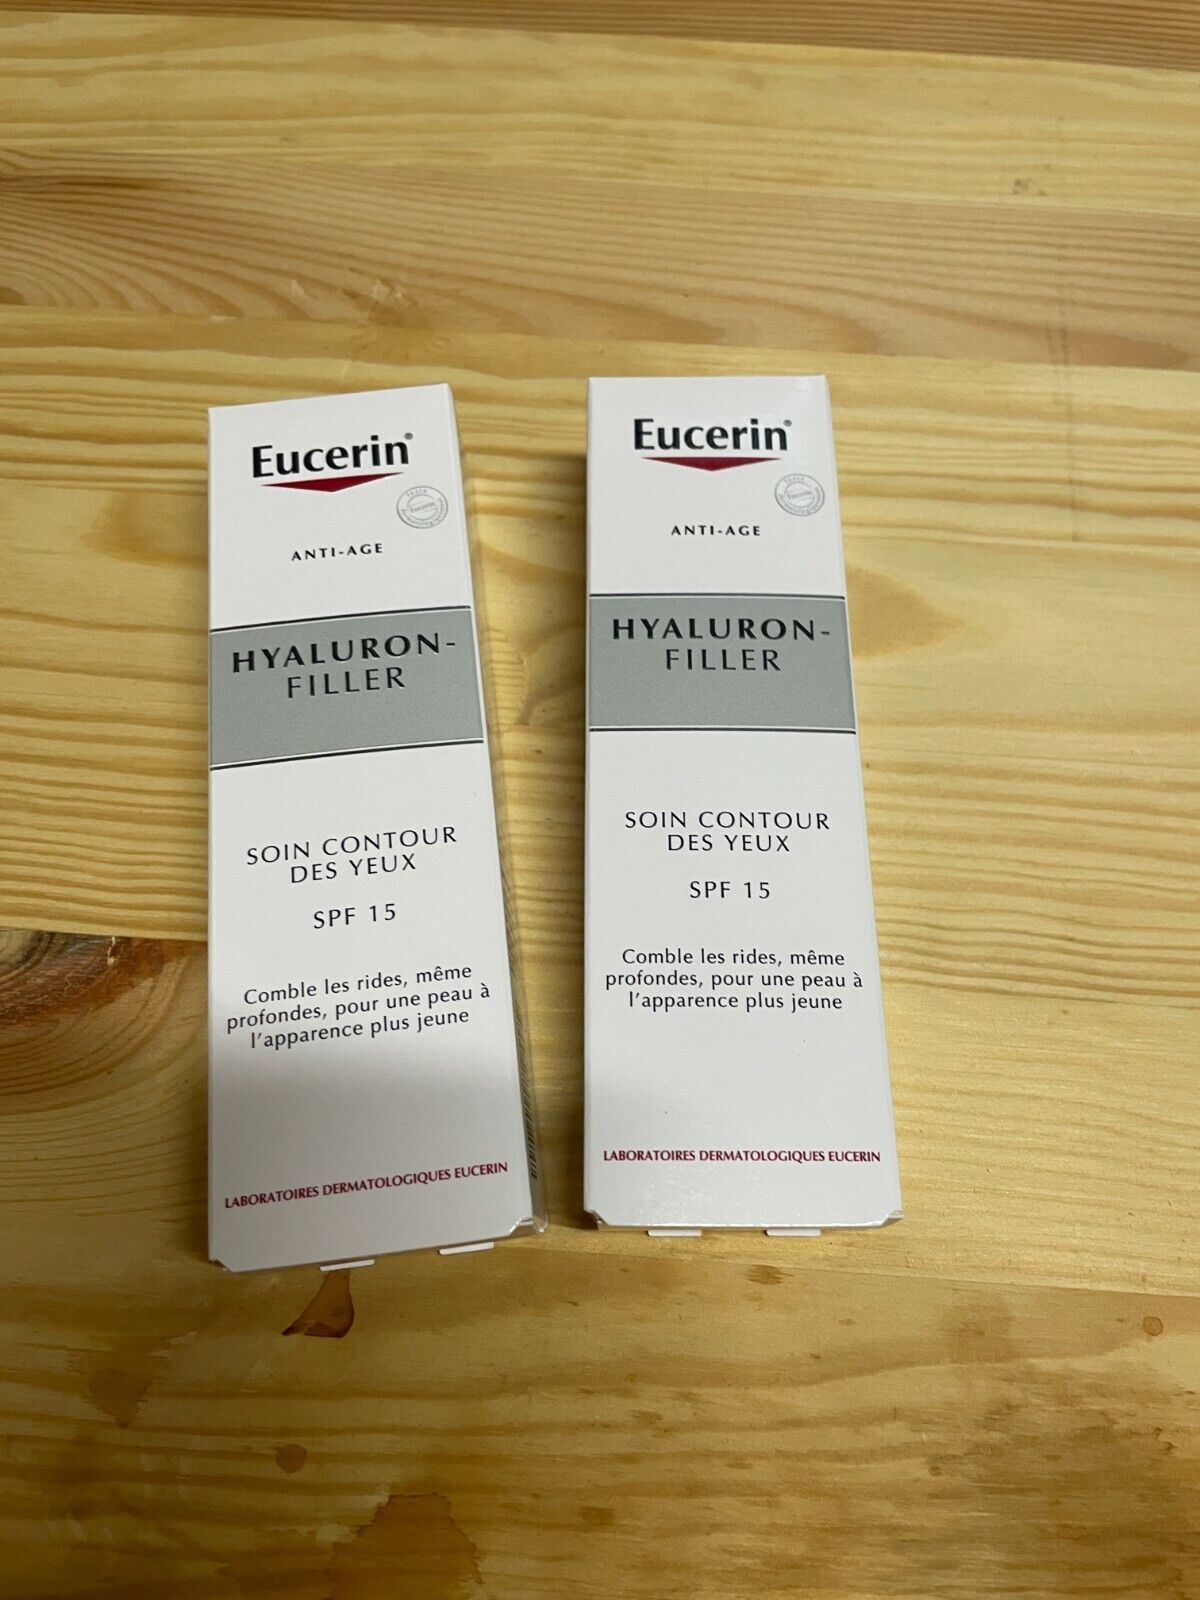 [NEUOVP] Eucerin Anti-age Hyaluron-Filler Augenpflege SPF15 15ml (2 pcs)